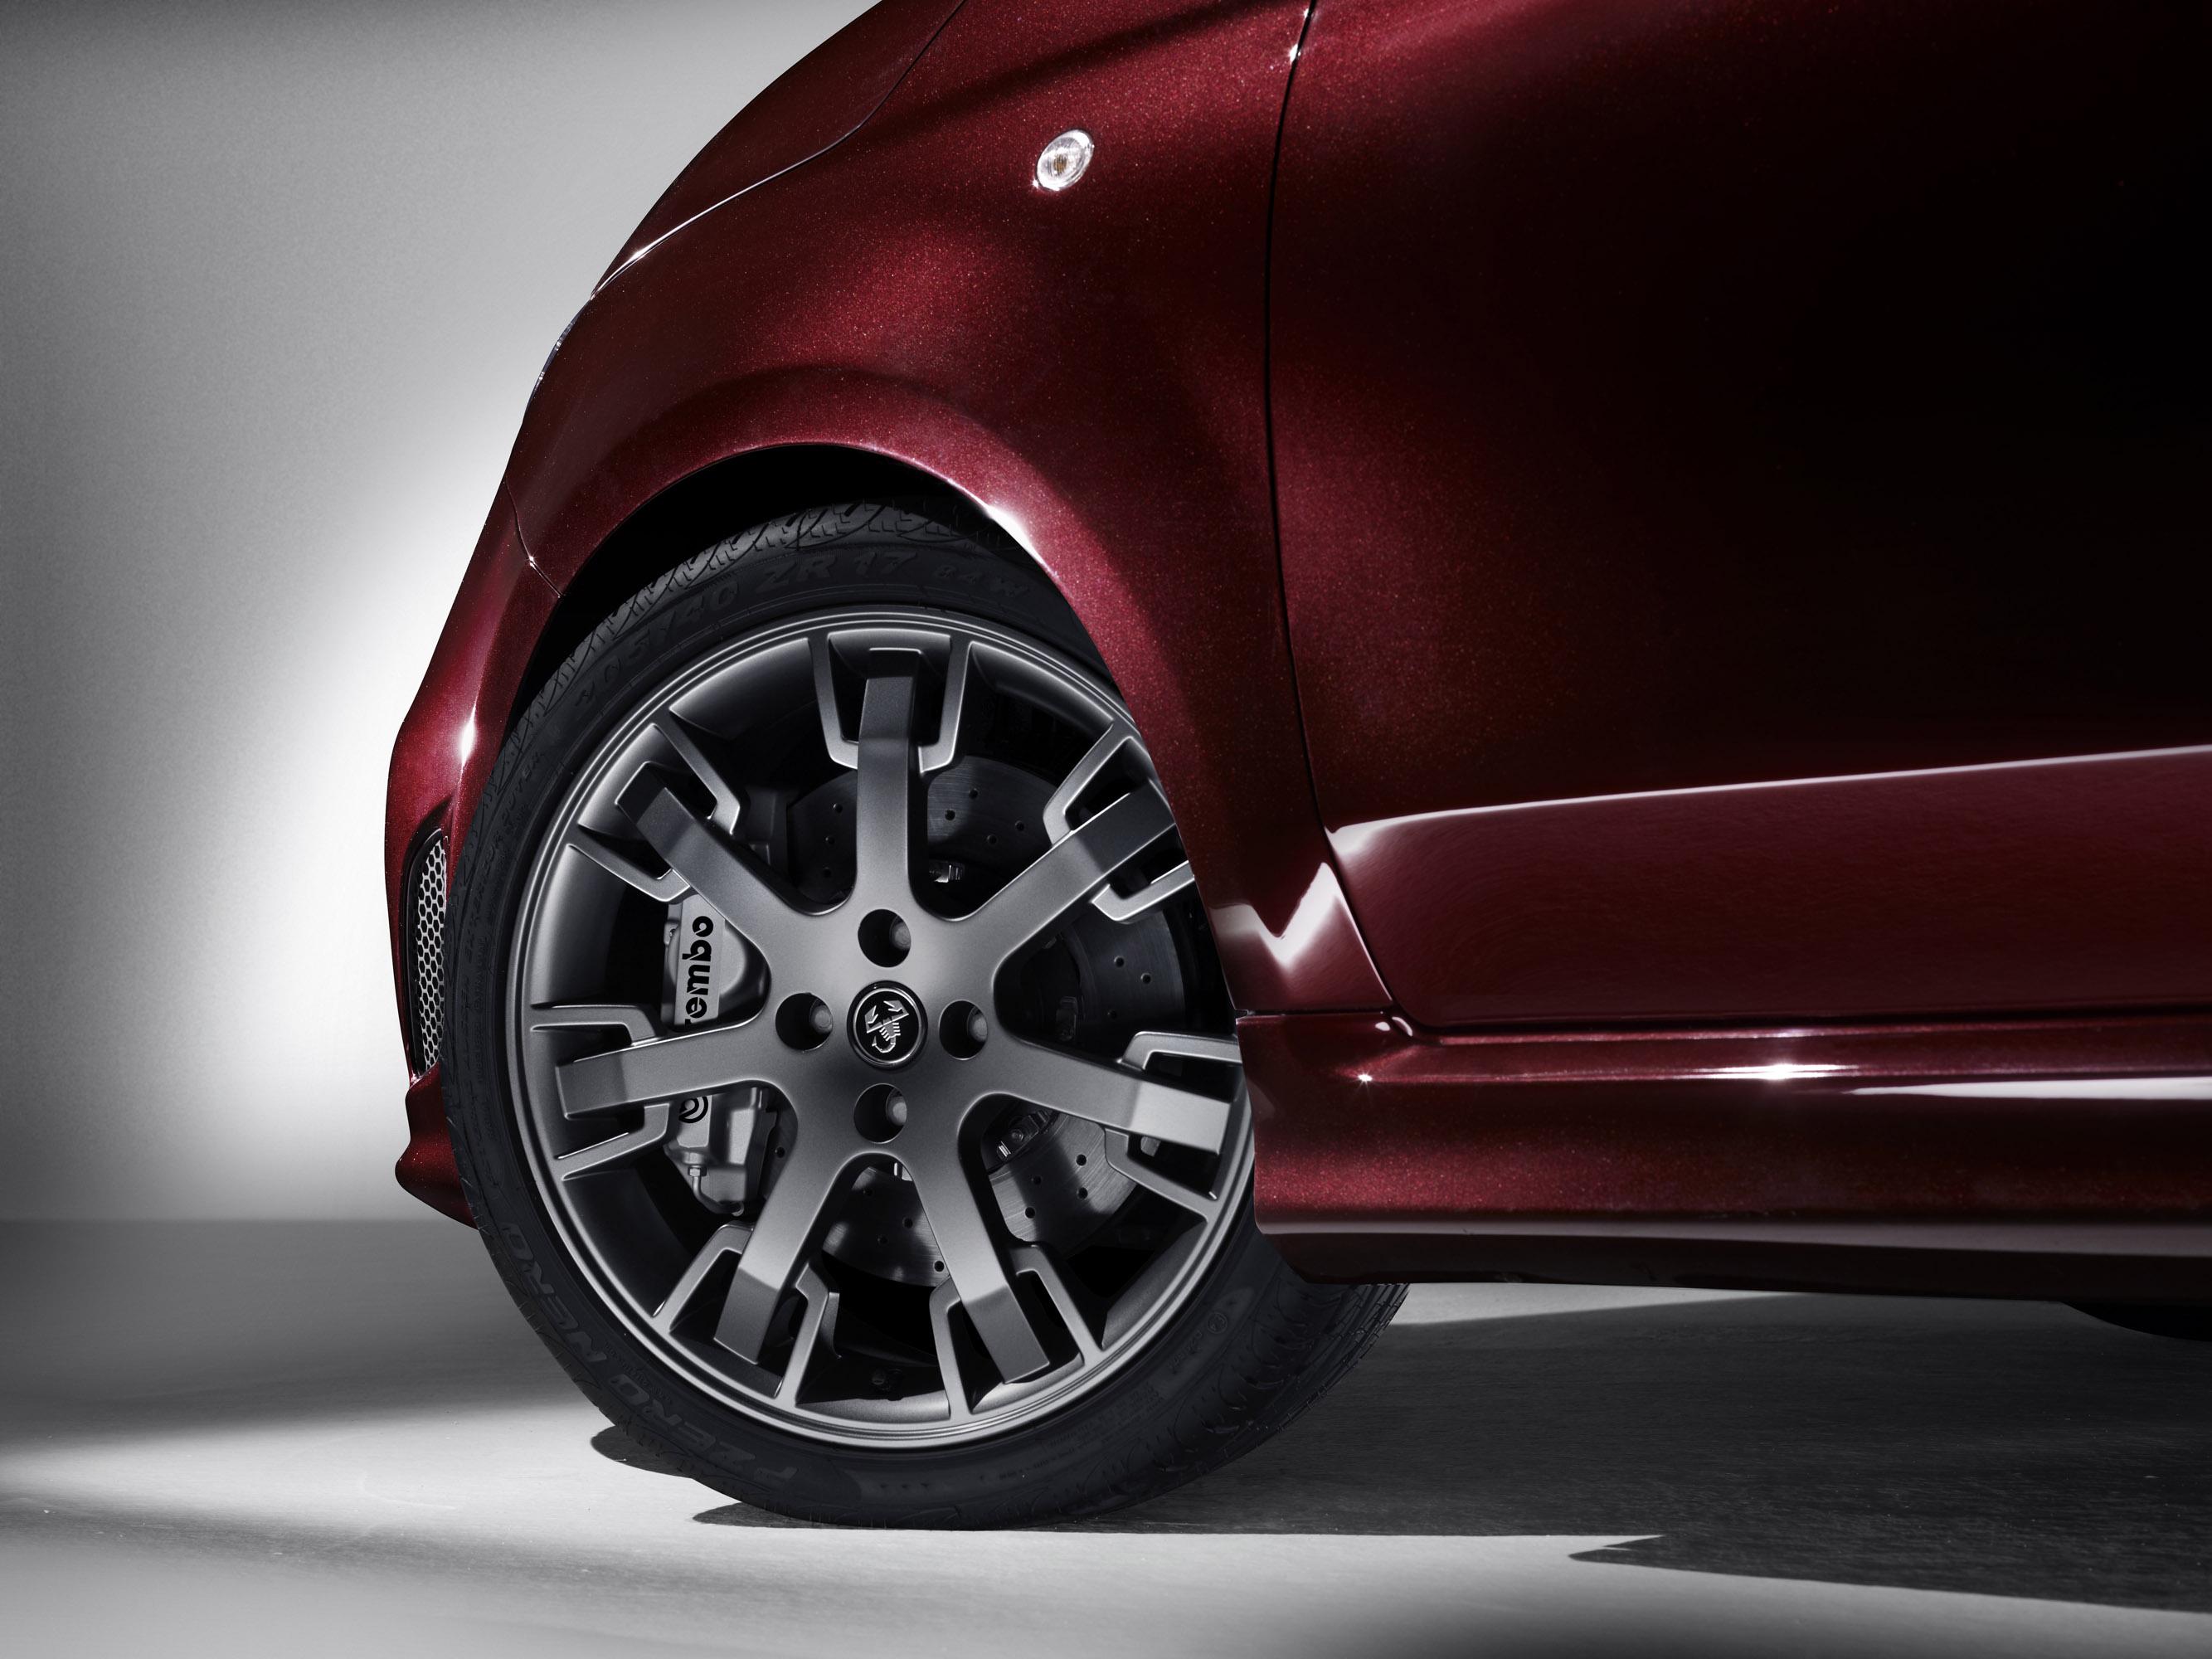 Abarth 695 Maserati Edition Price And Specs